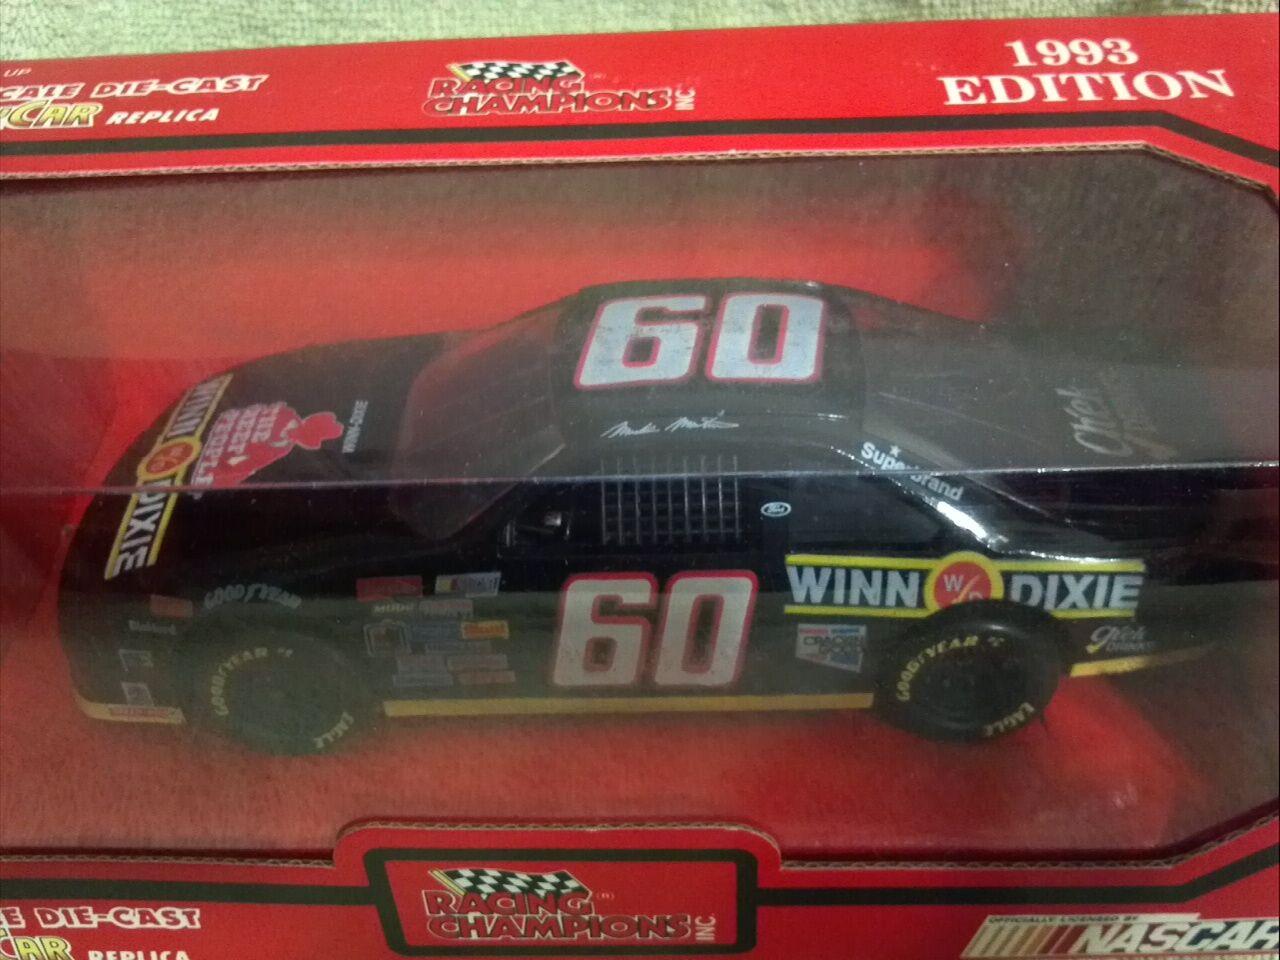 1993 Racing Champions MARK MARTIN  60 60 60 Winn-Dixie Nascar 1/24 Diecast - Nuovo 485477